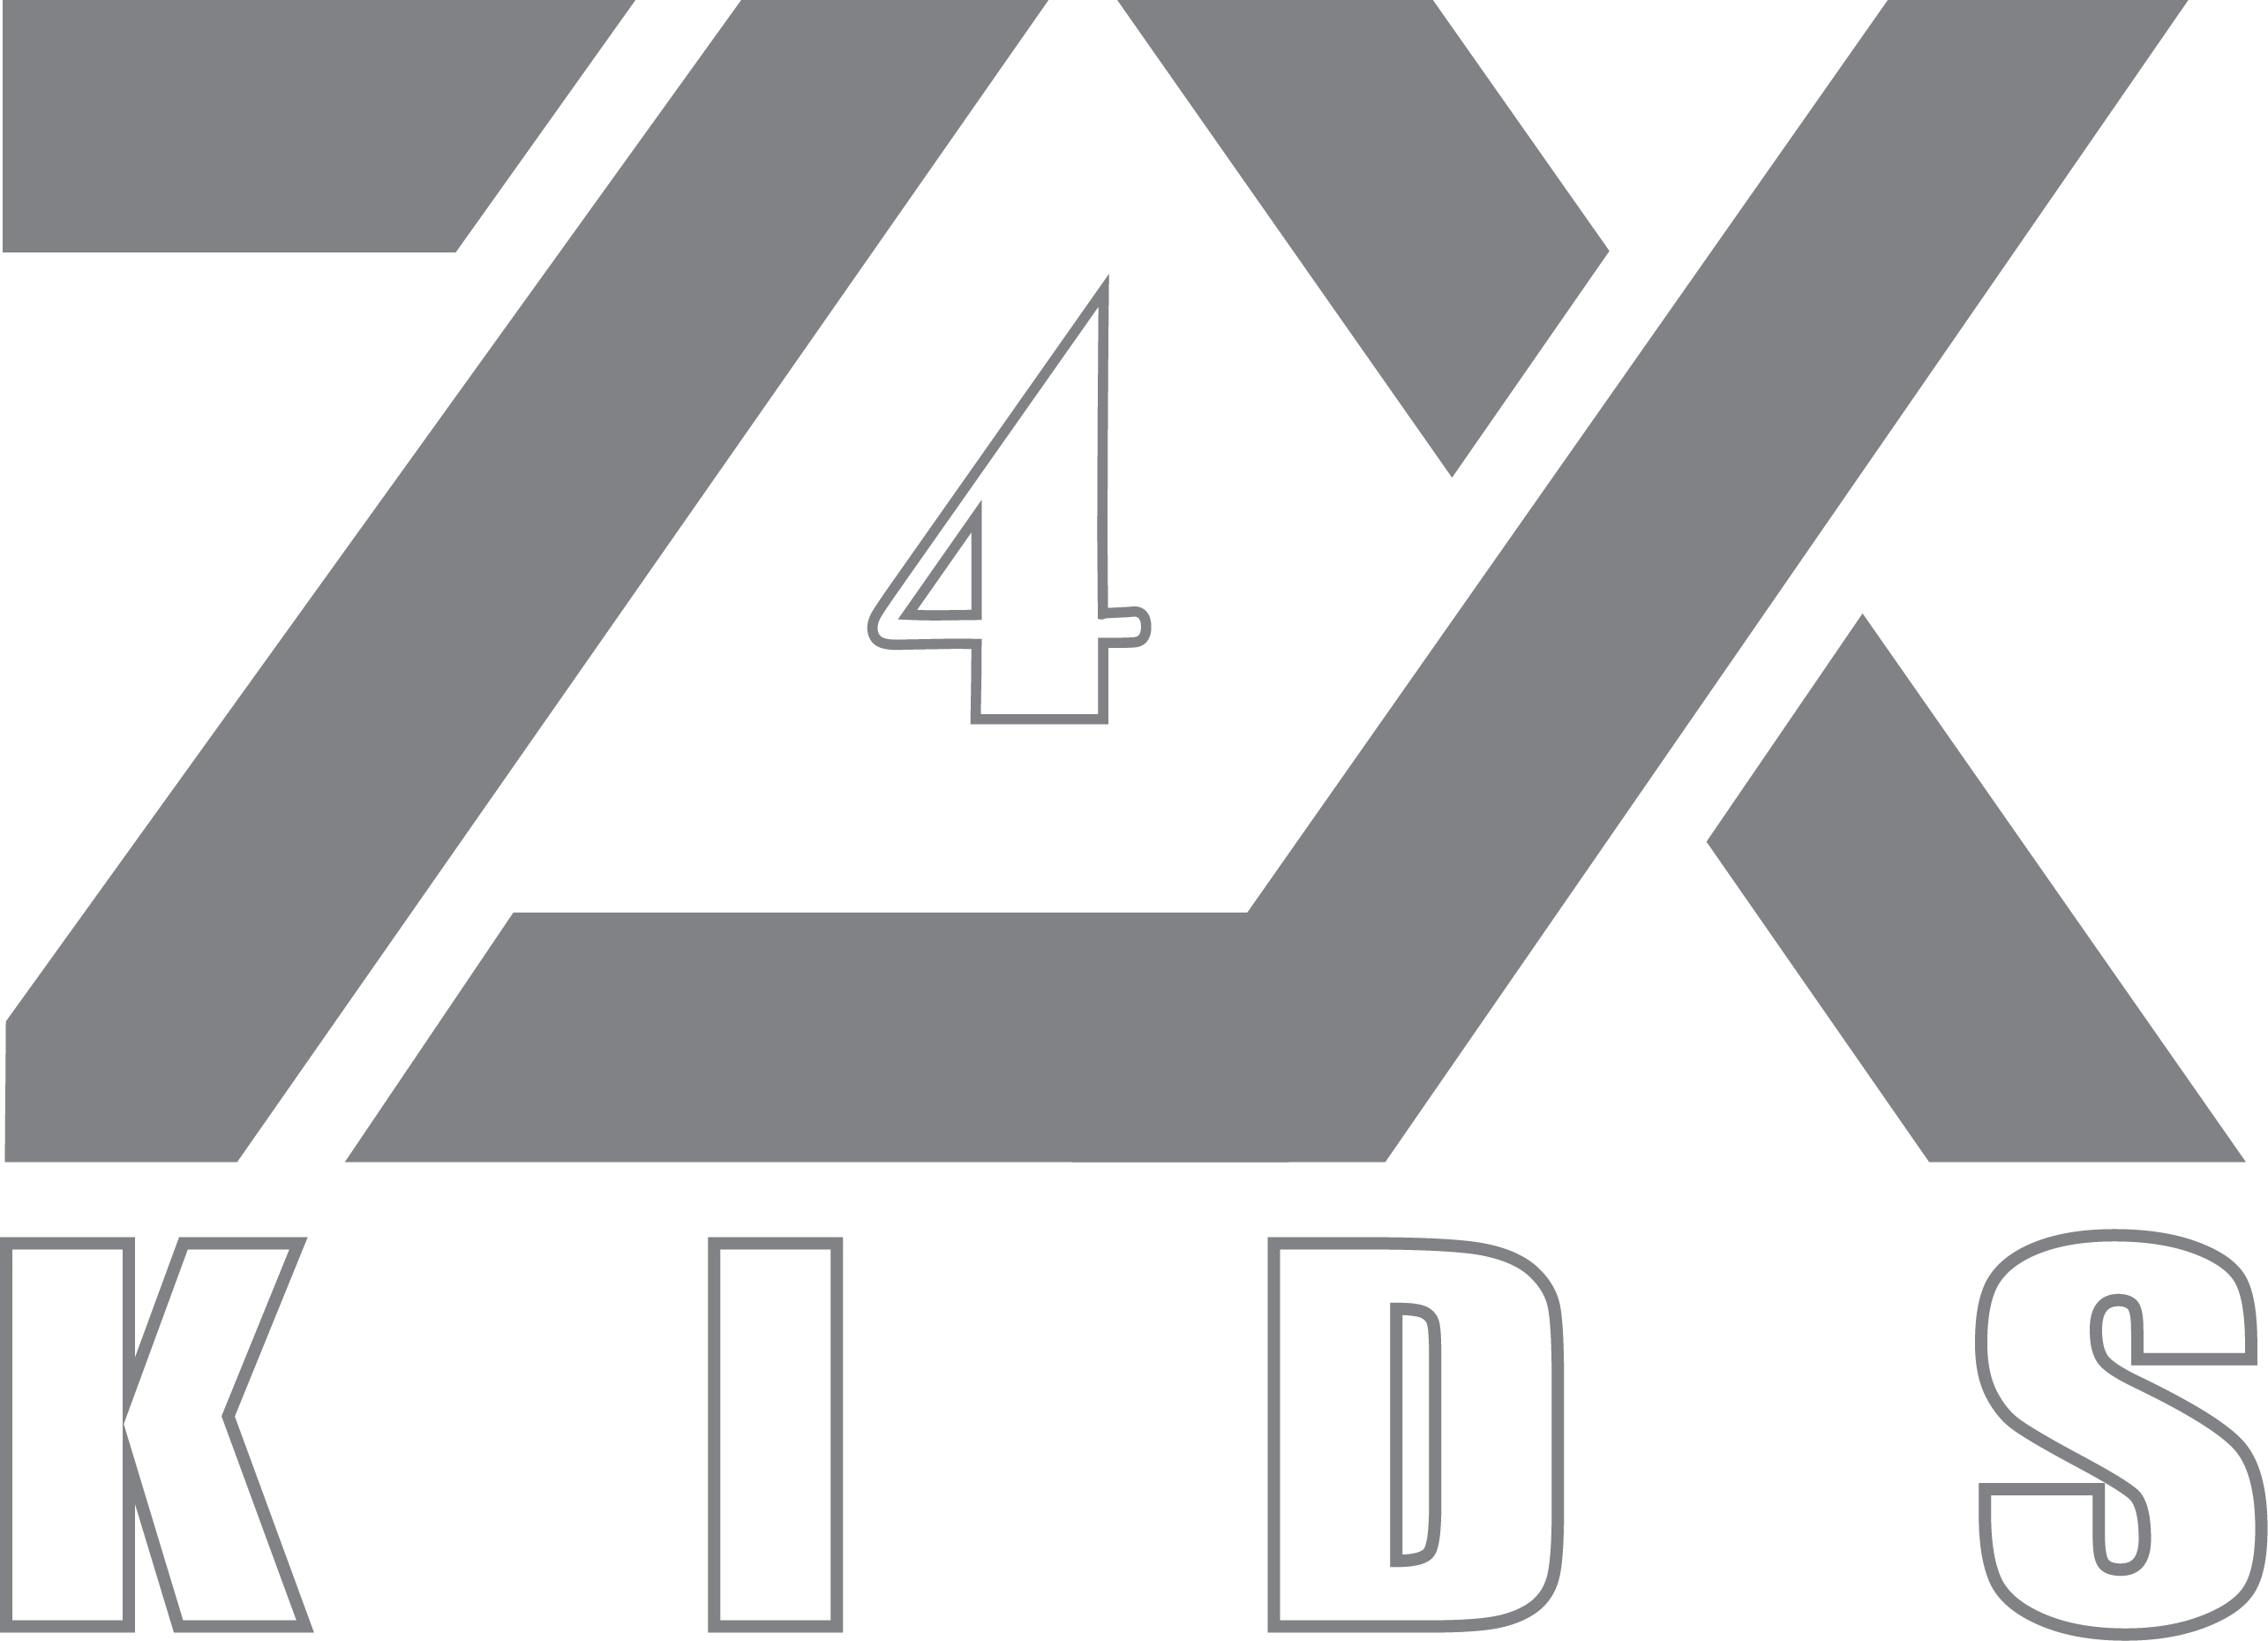 zx4kids-logo